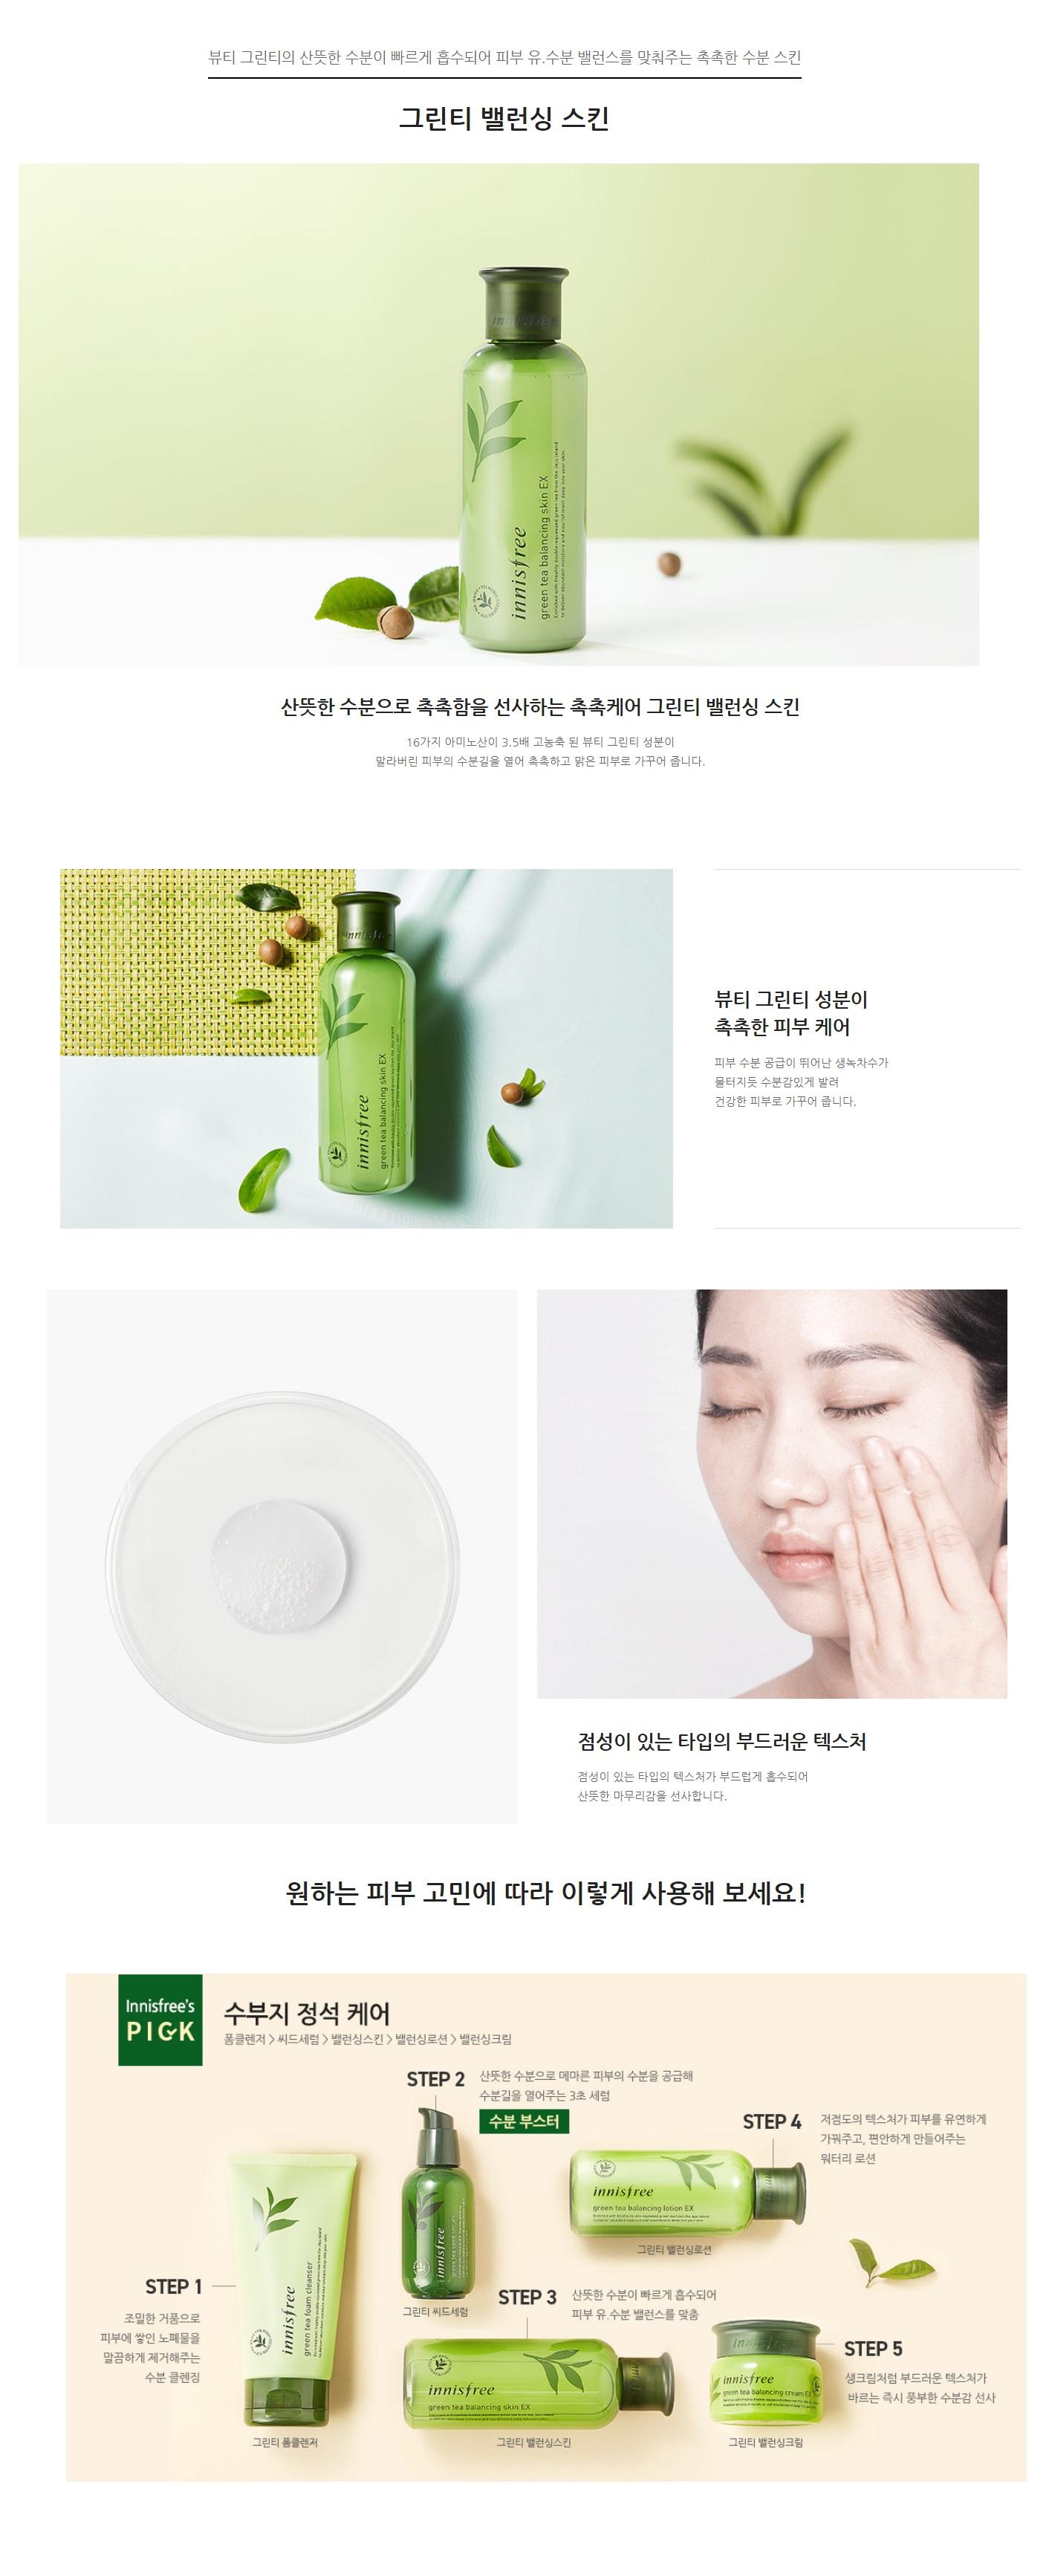 Innisfree Green Tea Balancing Skin Toner 200ml [Combination Skin] korean cosmetic skincare product online shop malaysia china usa1